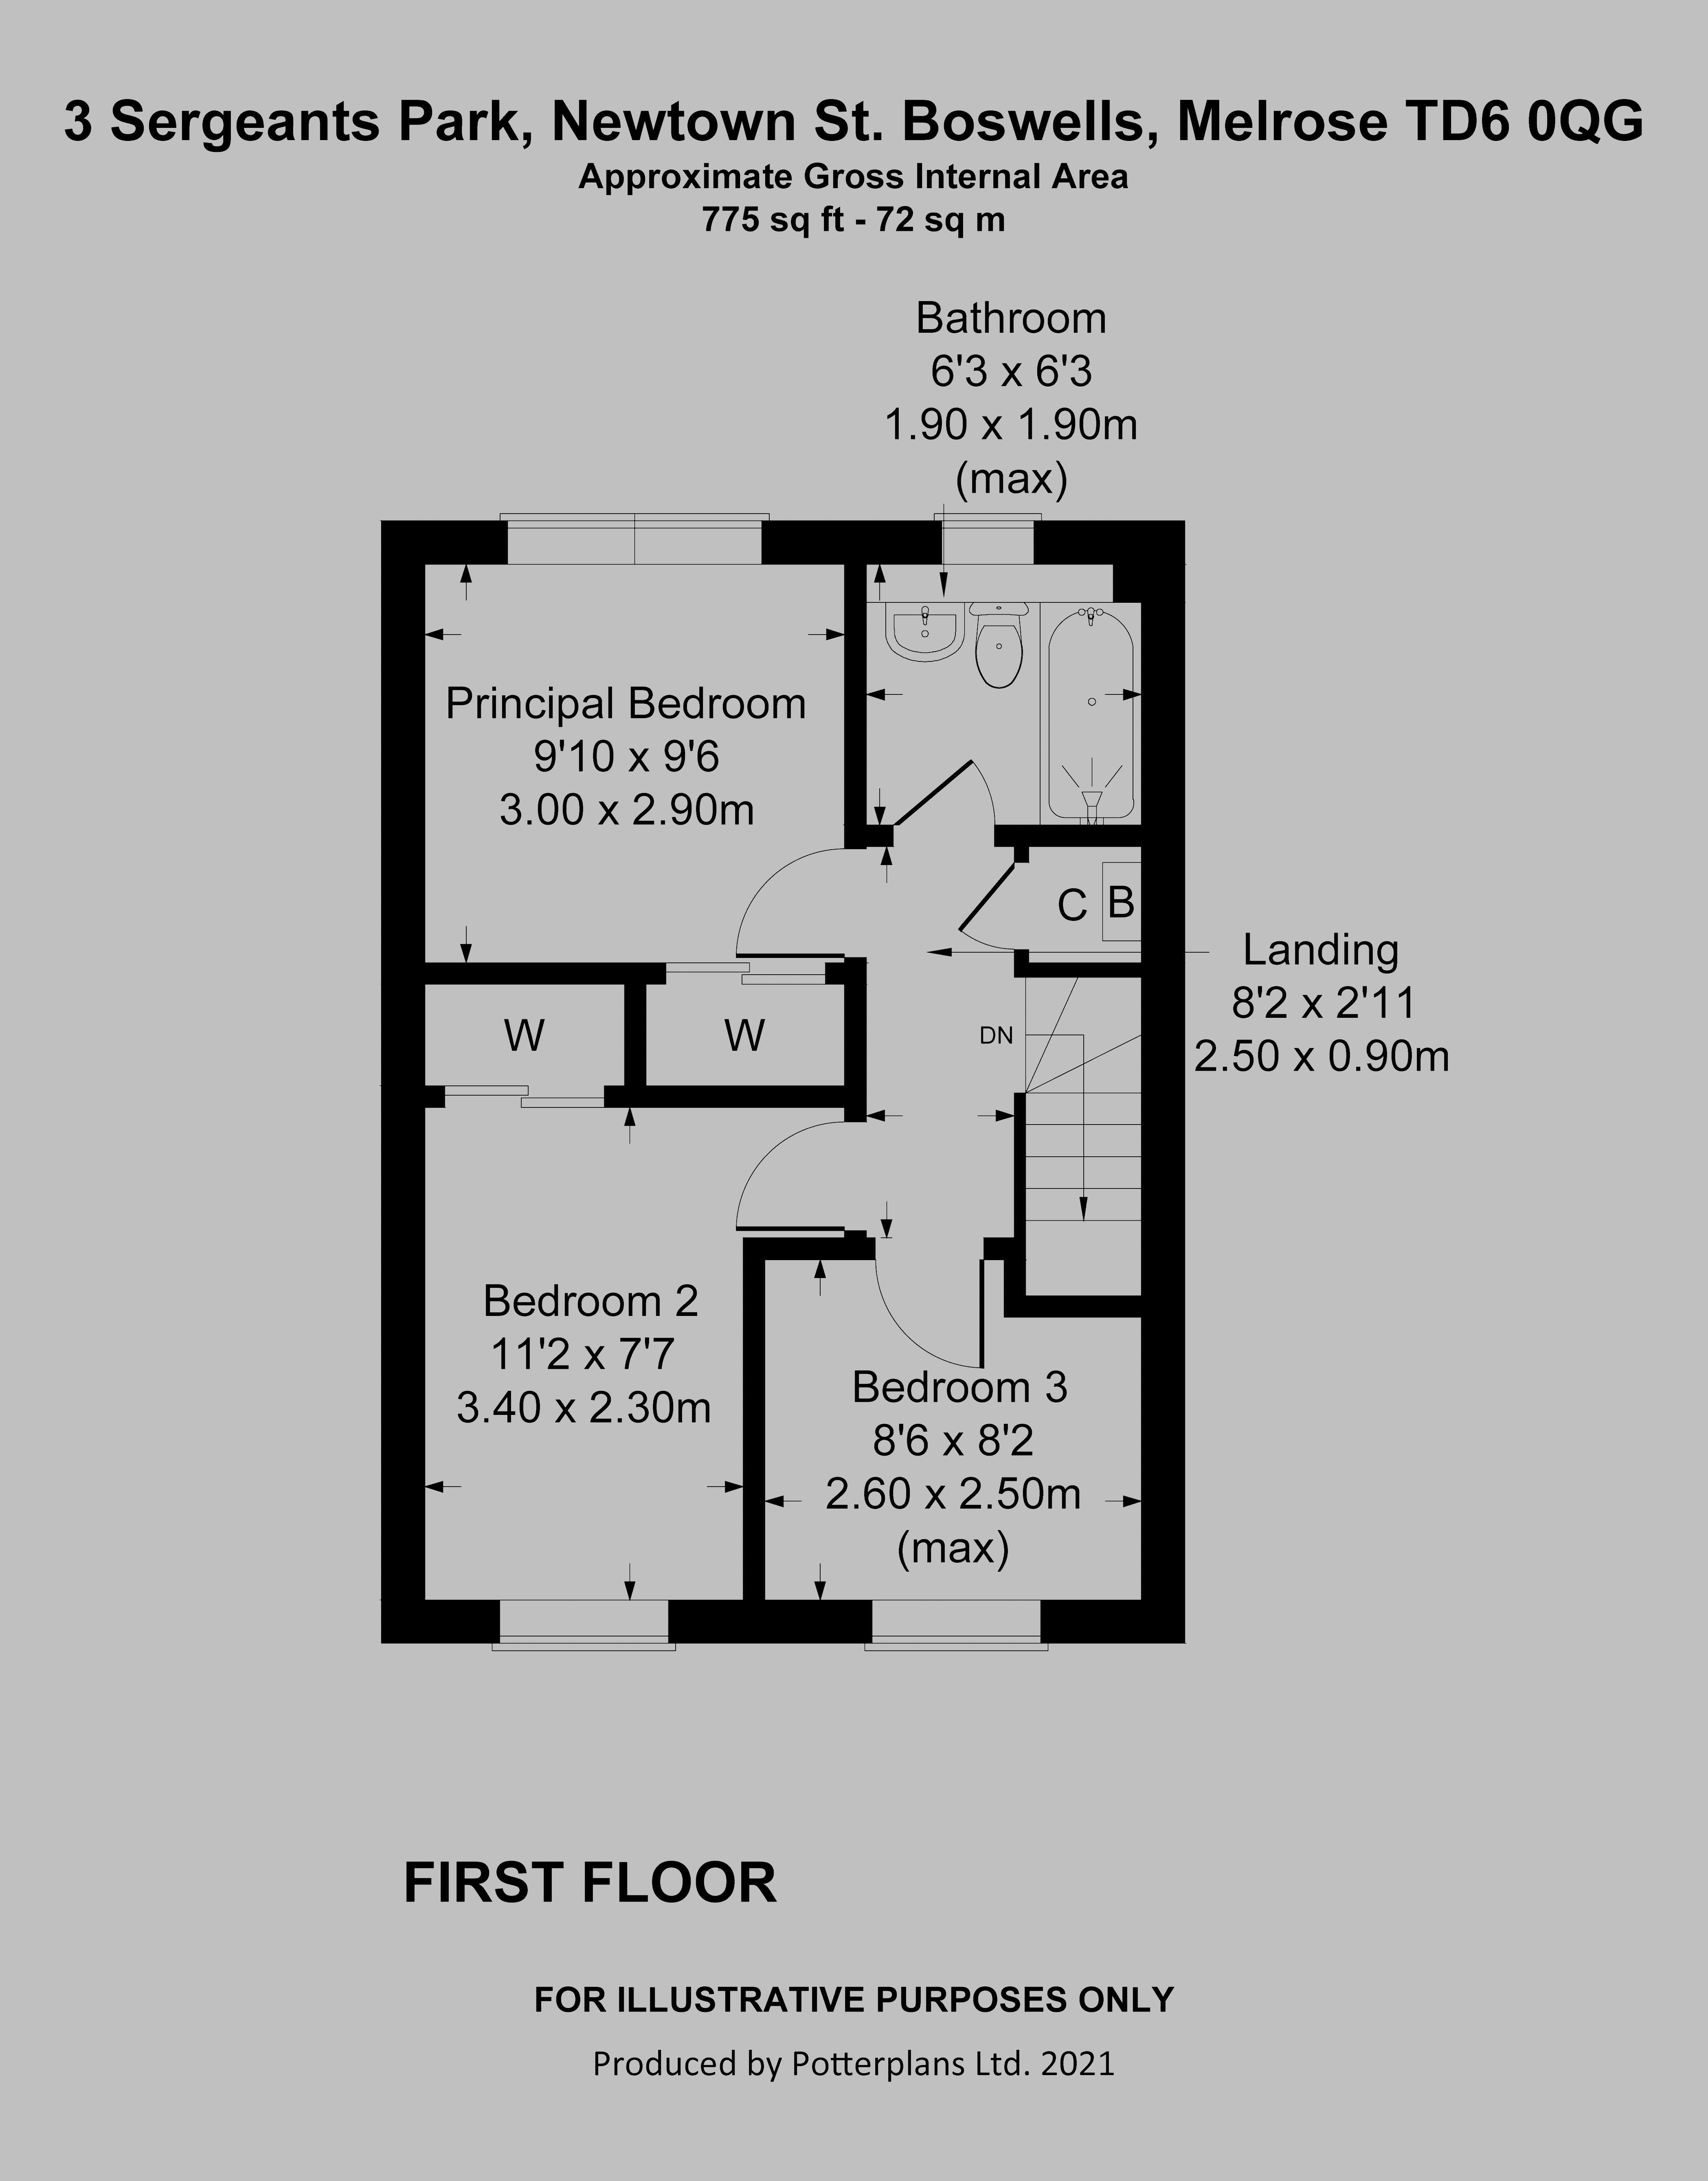 3 Sergeants Park First Floor